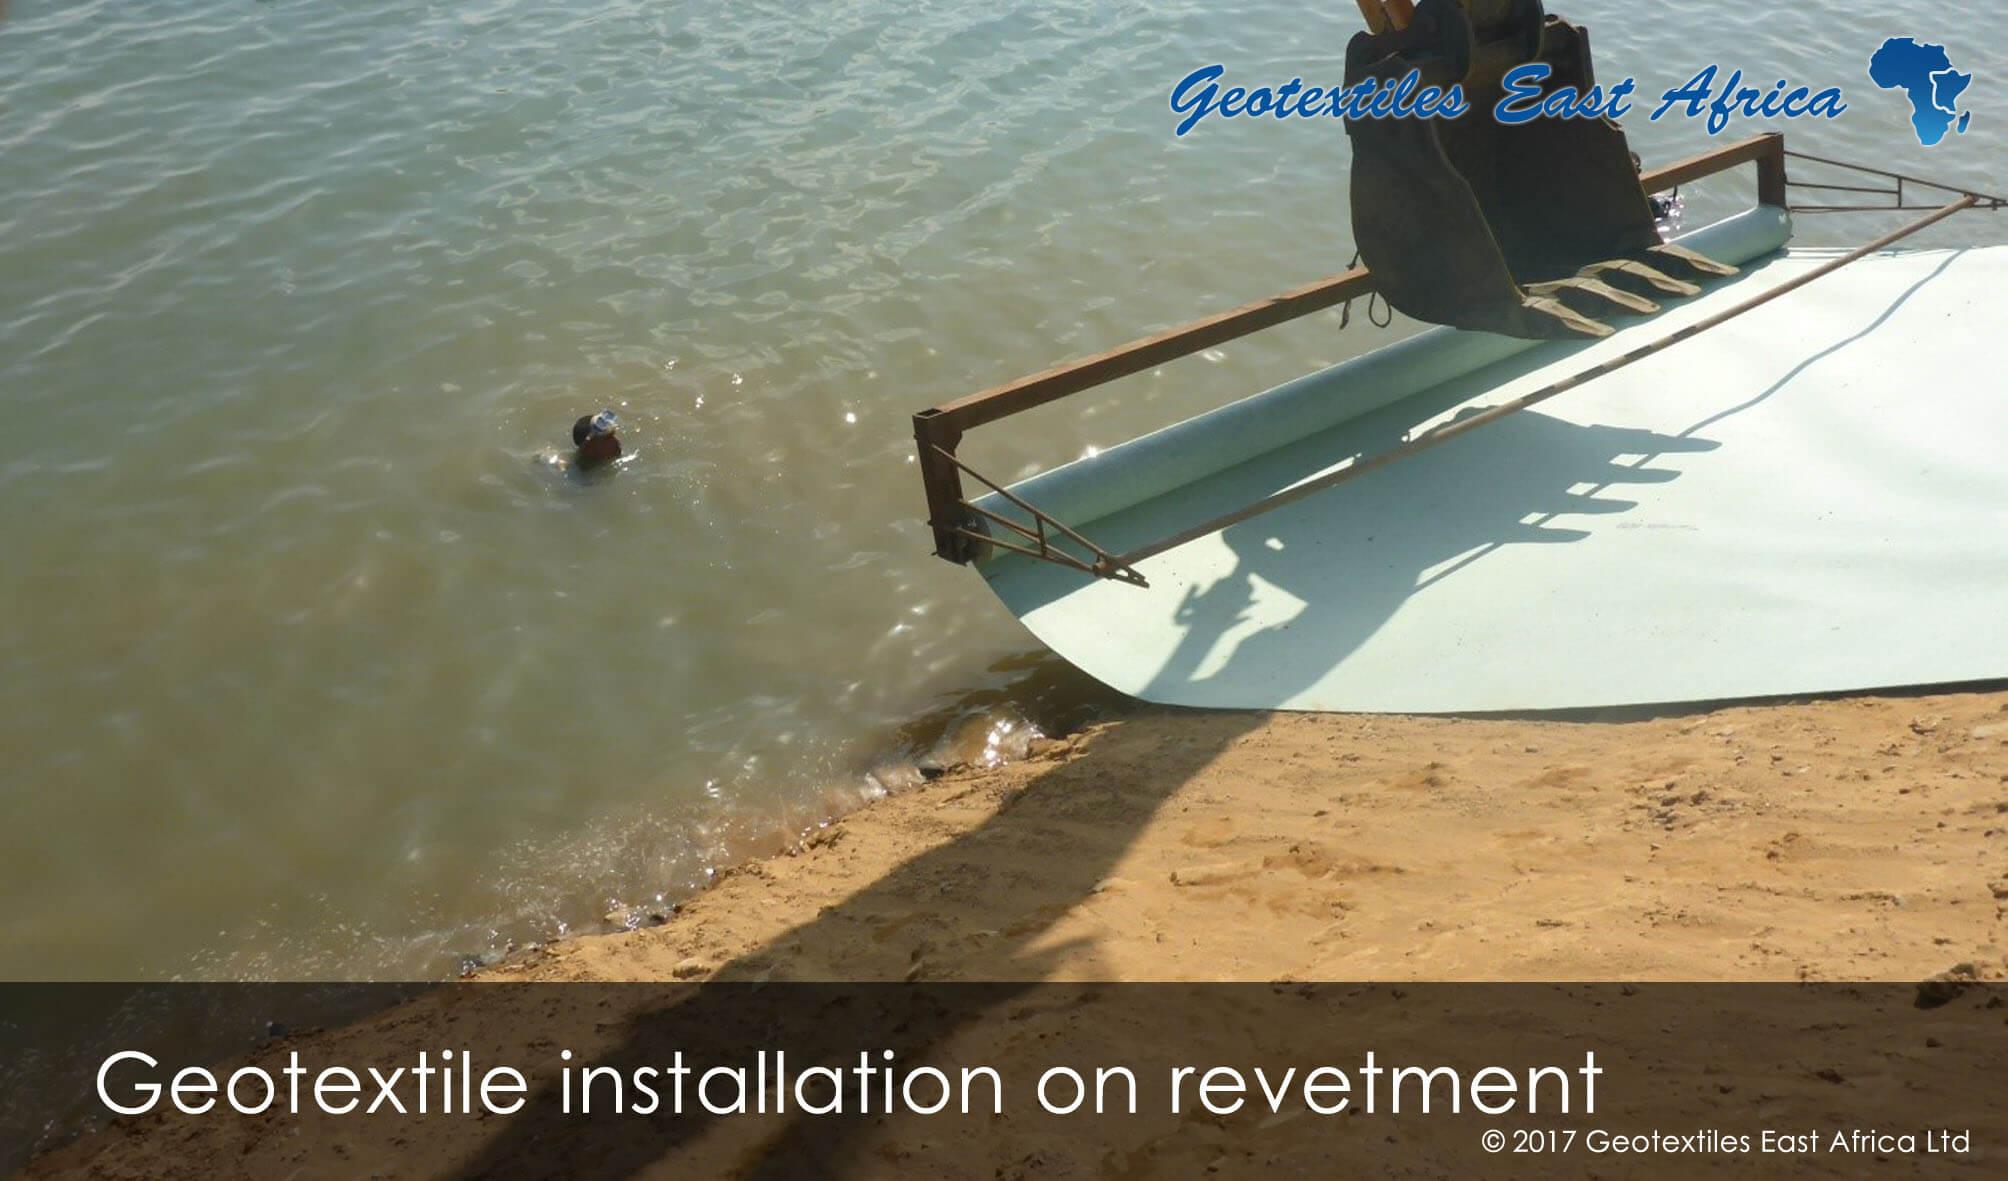 geotextile installation on revetment at KPA